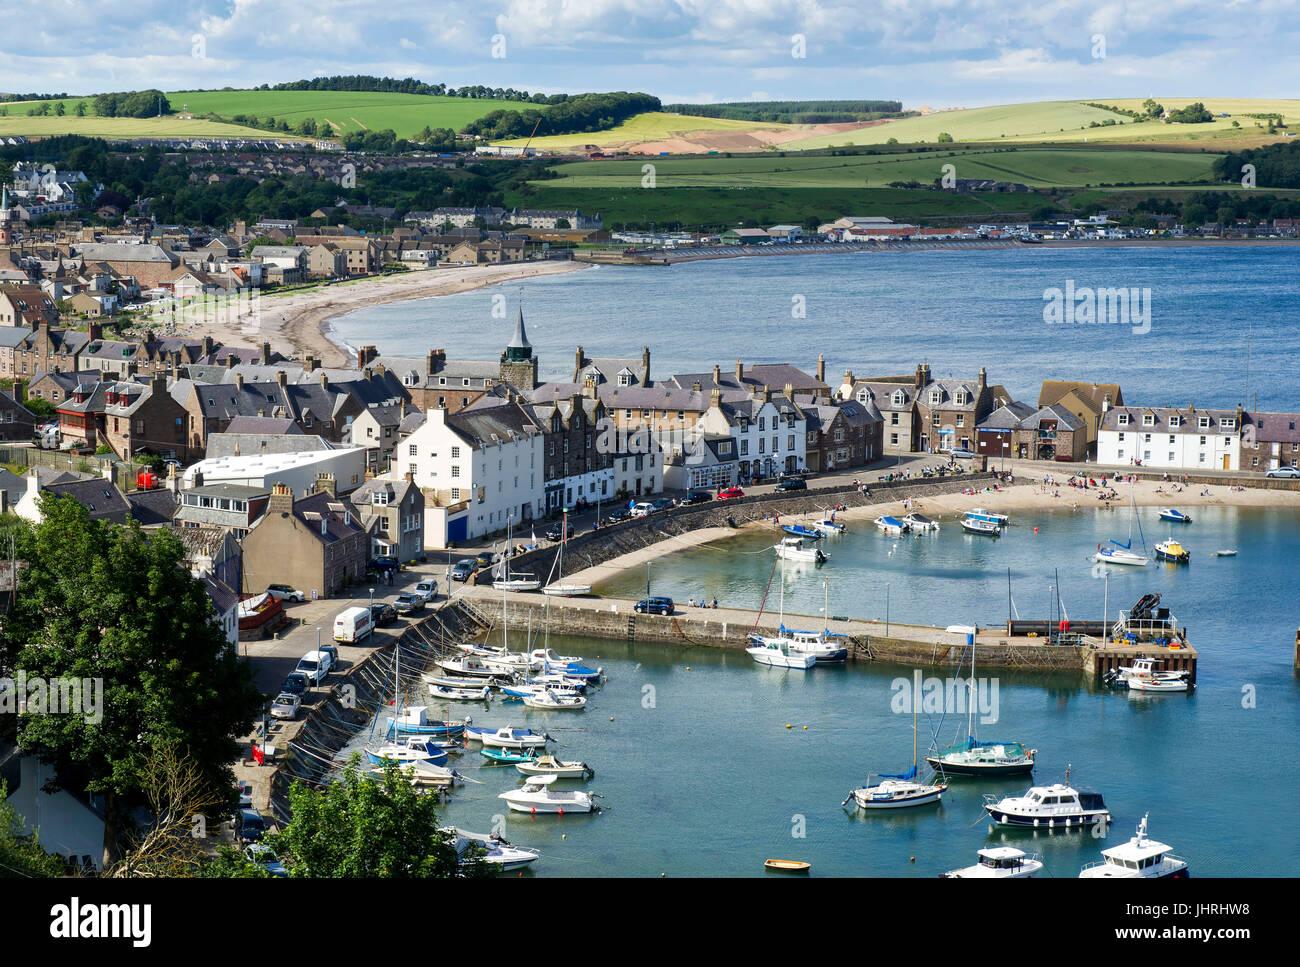 View across Stonehaven harbour, Aberdeenshire, Scotland. - Stock Image